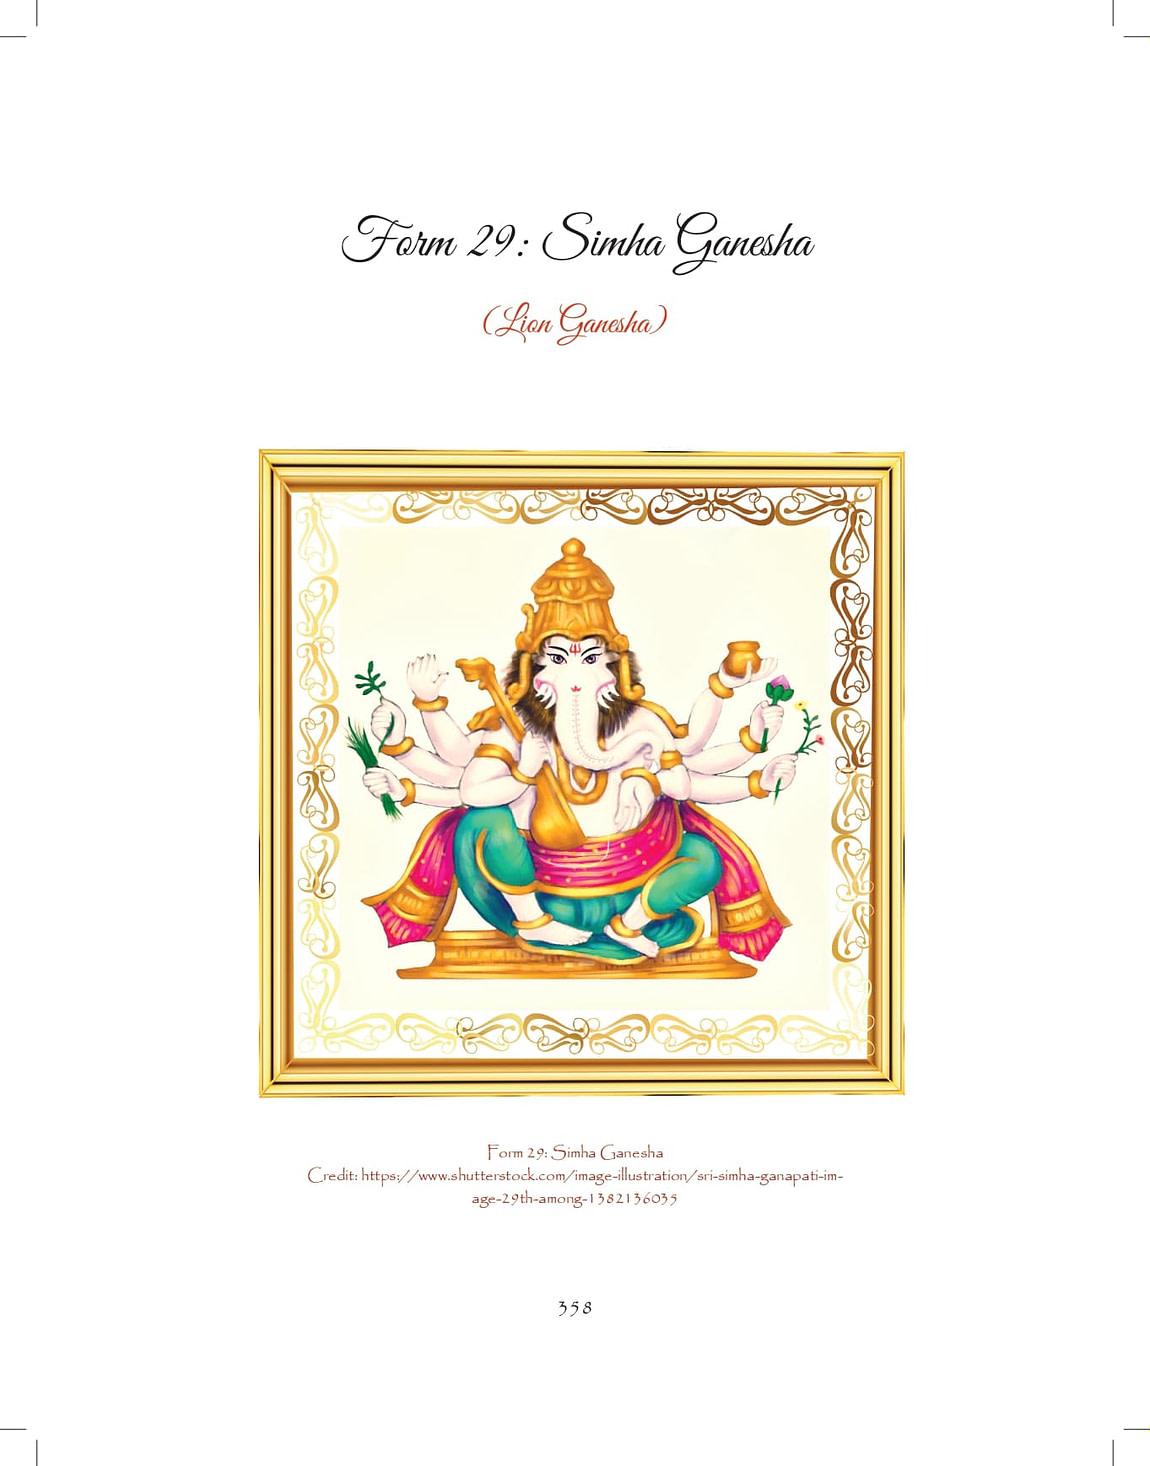 Ganesh-print_pages-to-jpg-0358.jpg